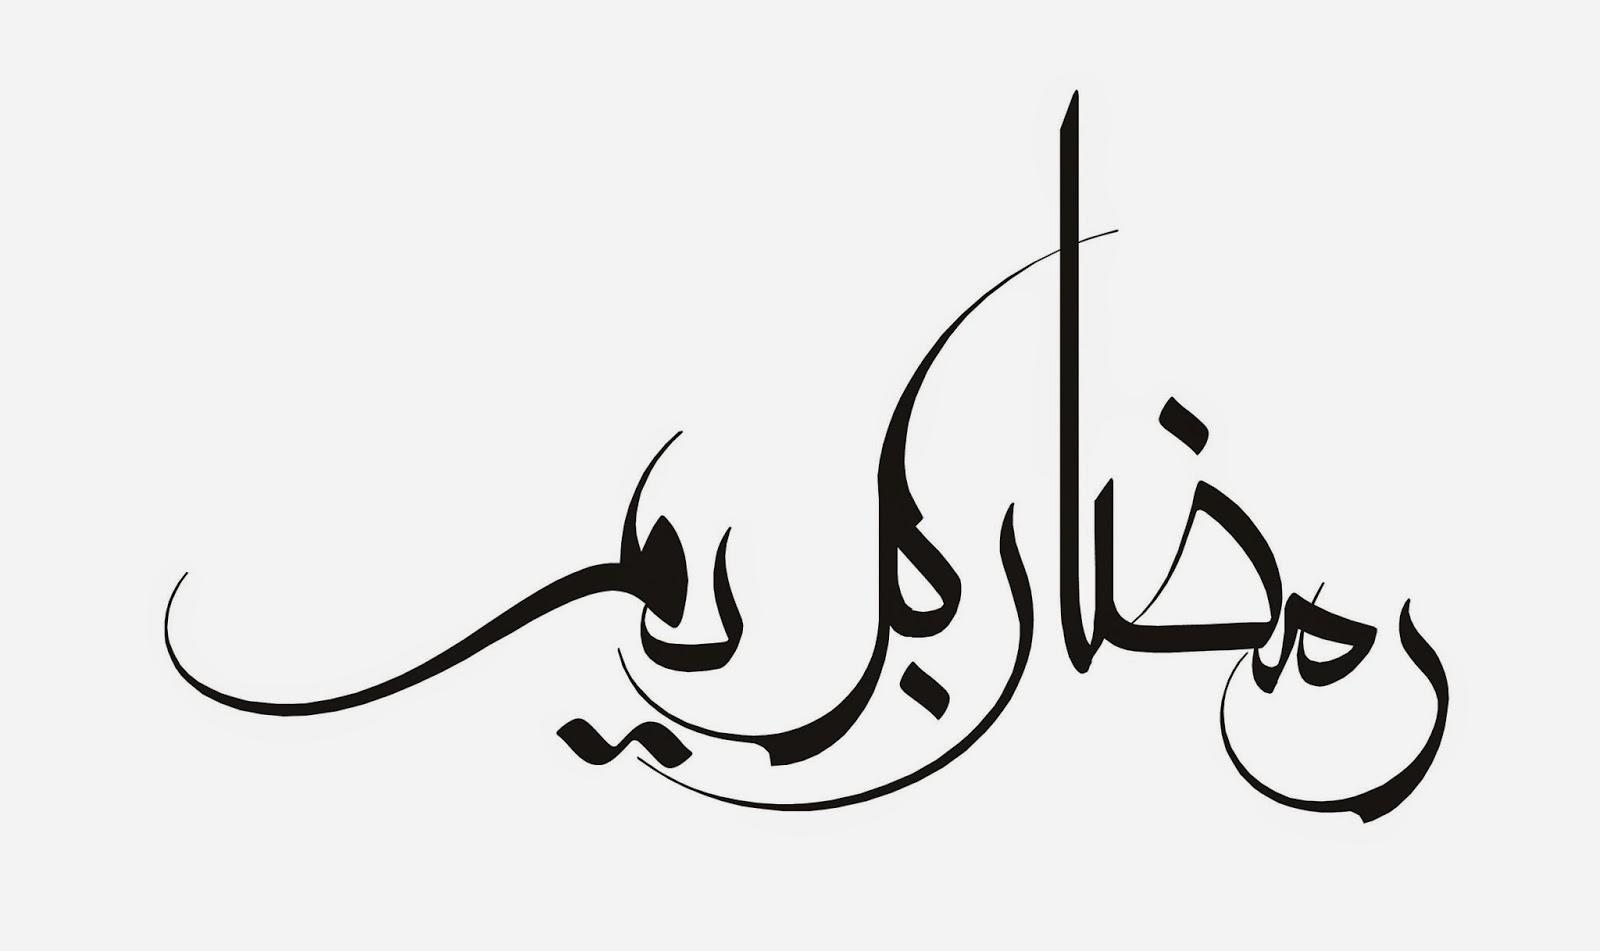 Arabic calligraphy clipart.